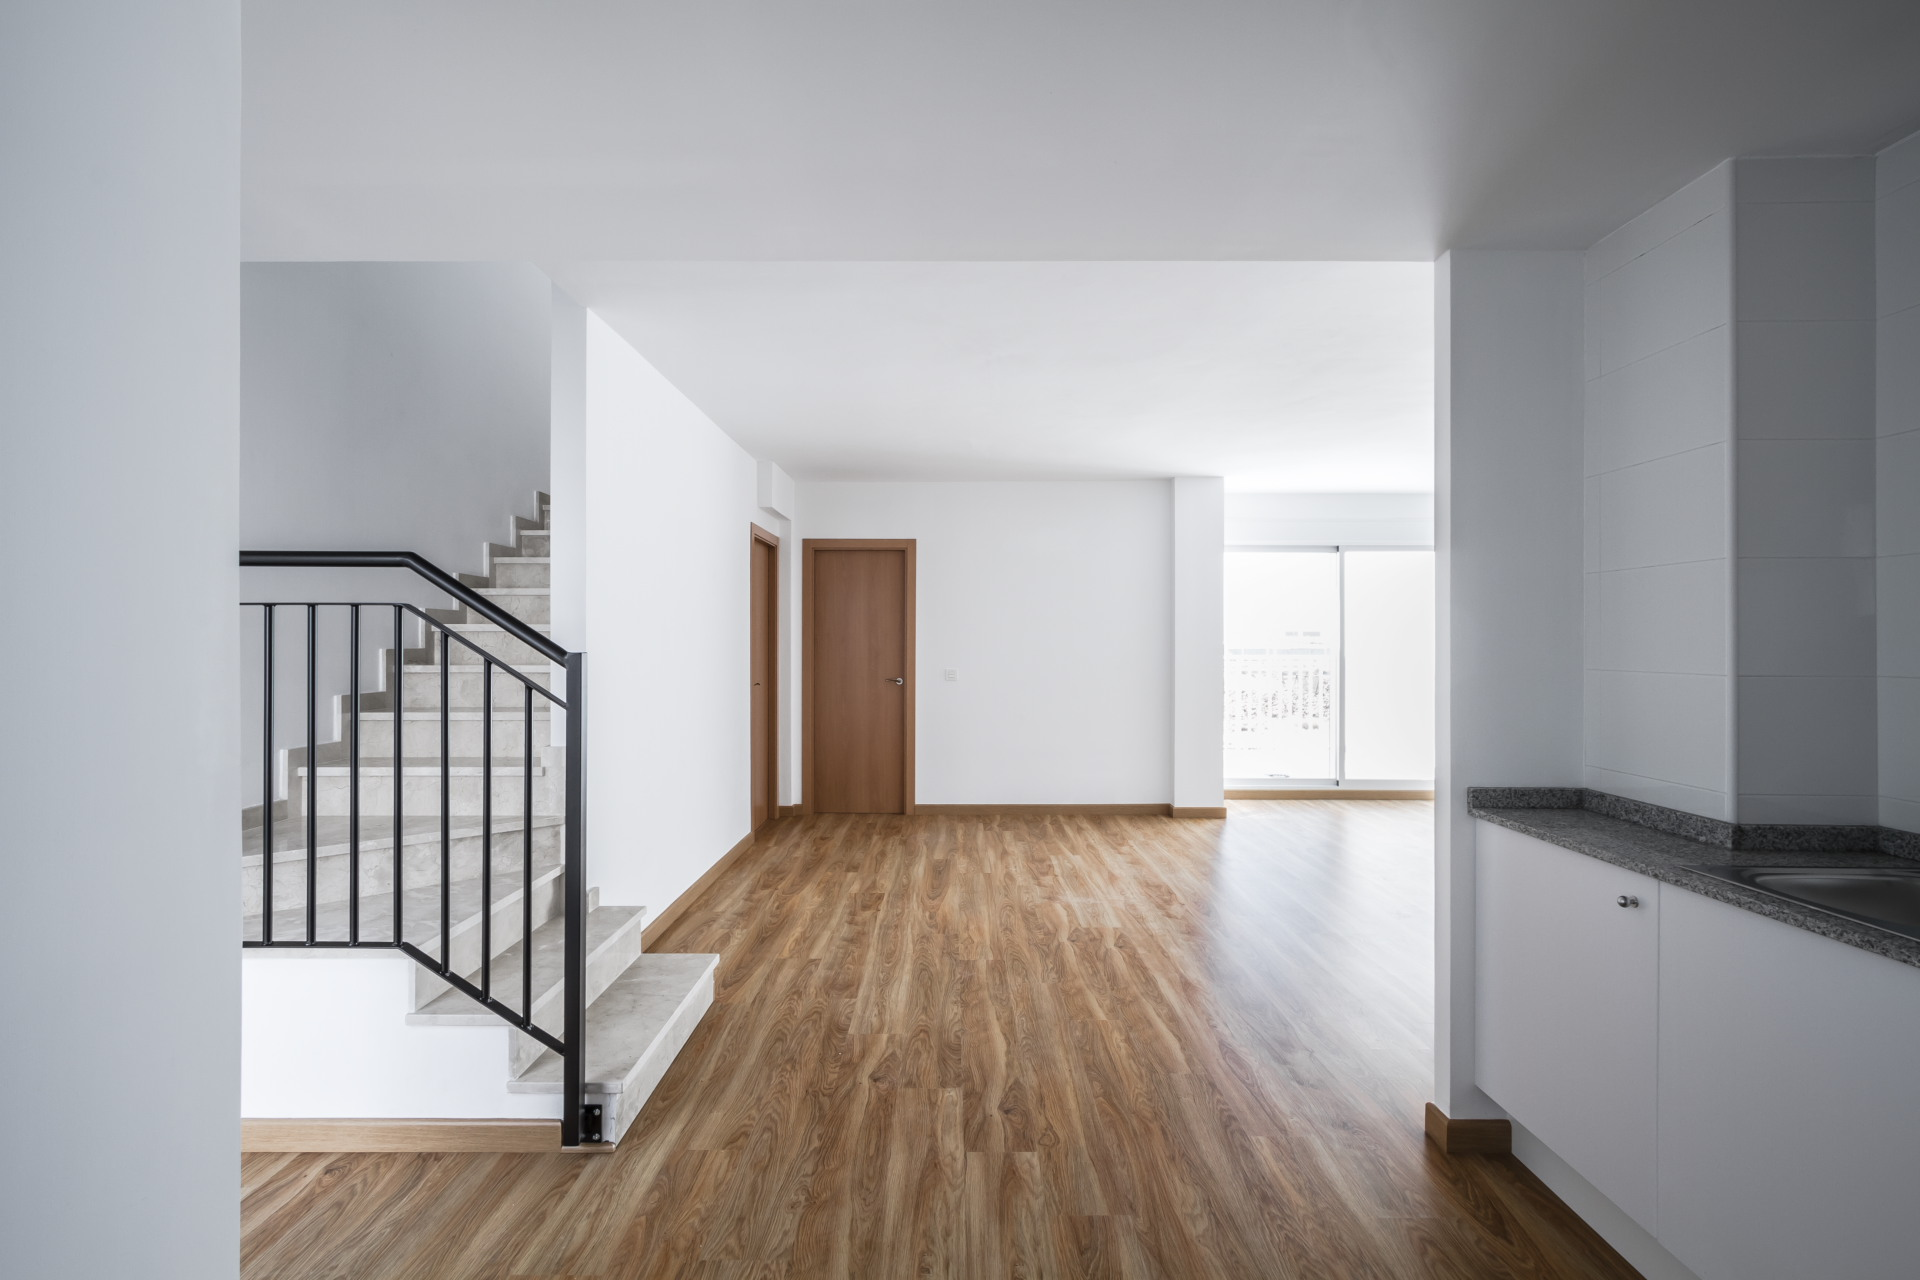 fotografia-arquitectura-valencia-german-cabo-viraje-sagunto (11)